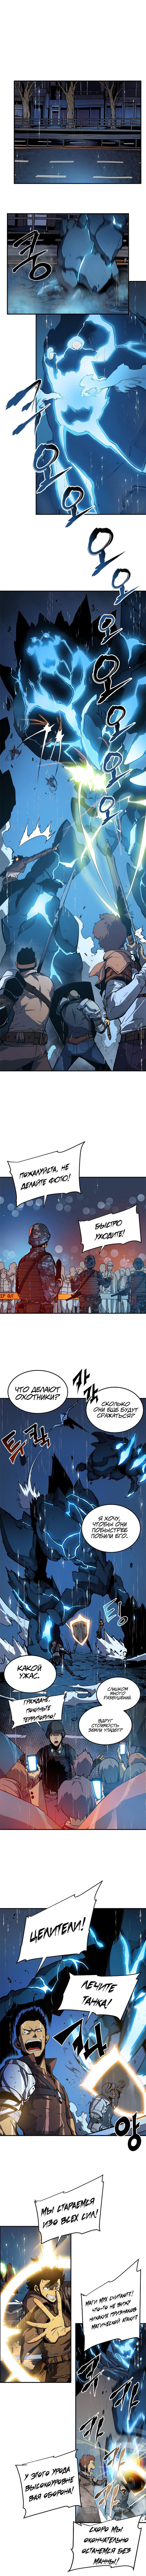 https://r1.ninemanga.com/comics/pic3/13/35341/1292547/1545648784298.jpg Page 4